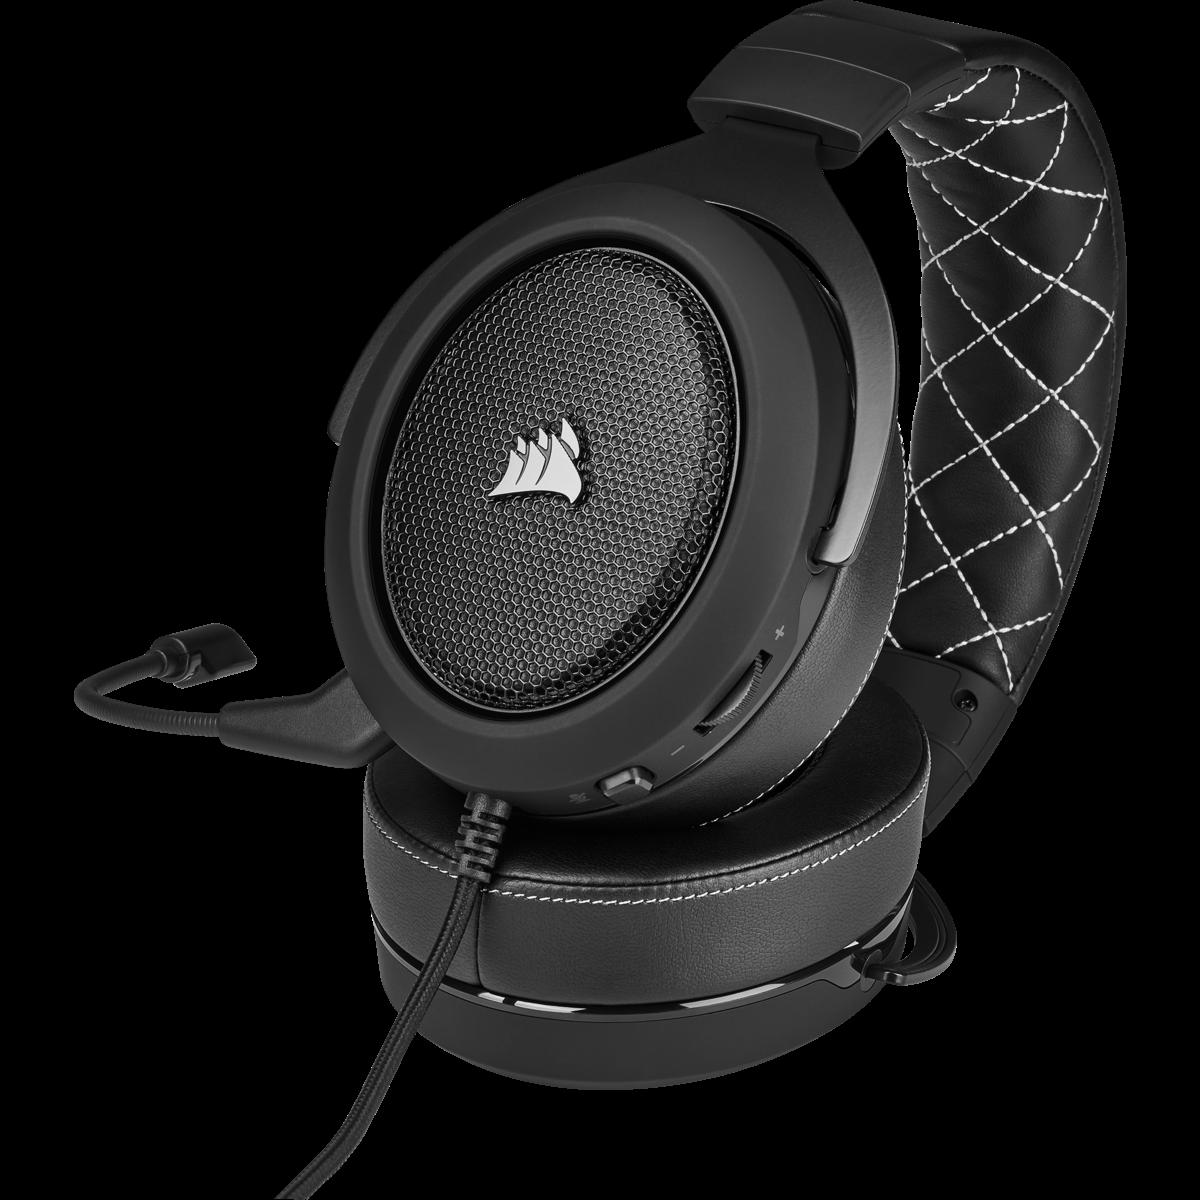 Headset Gamer Corsair HS60 Pro, Surround 7.1, Carbon, CA-9011213-NA